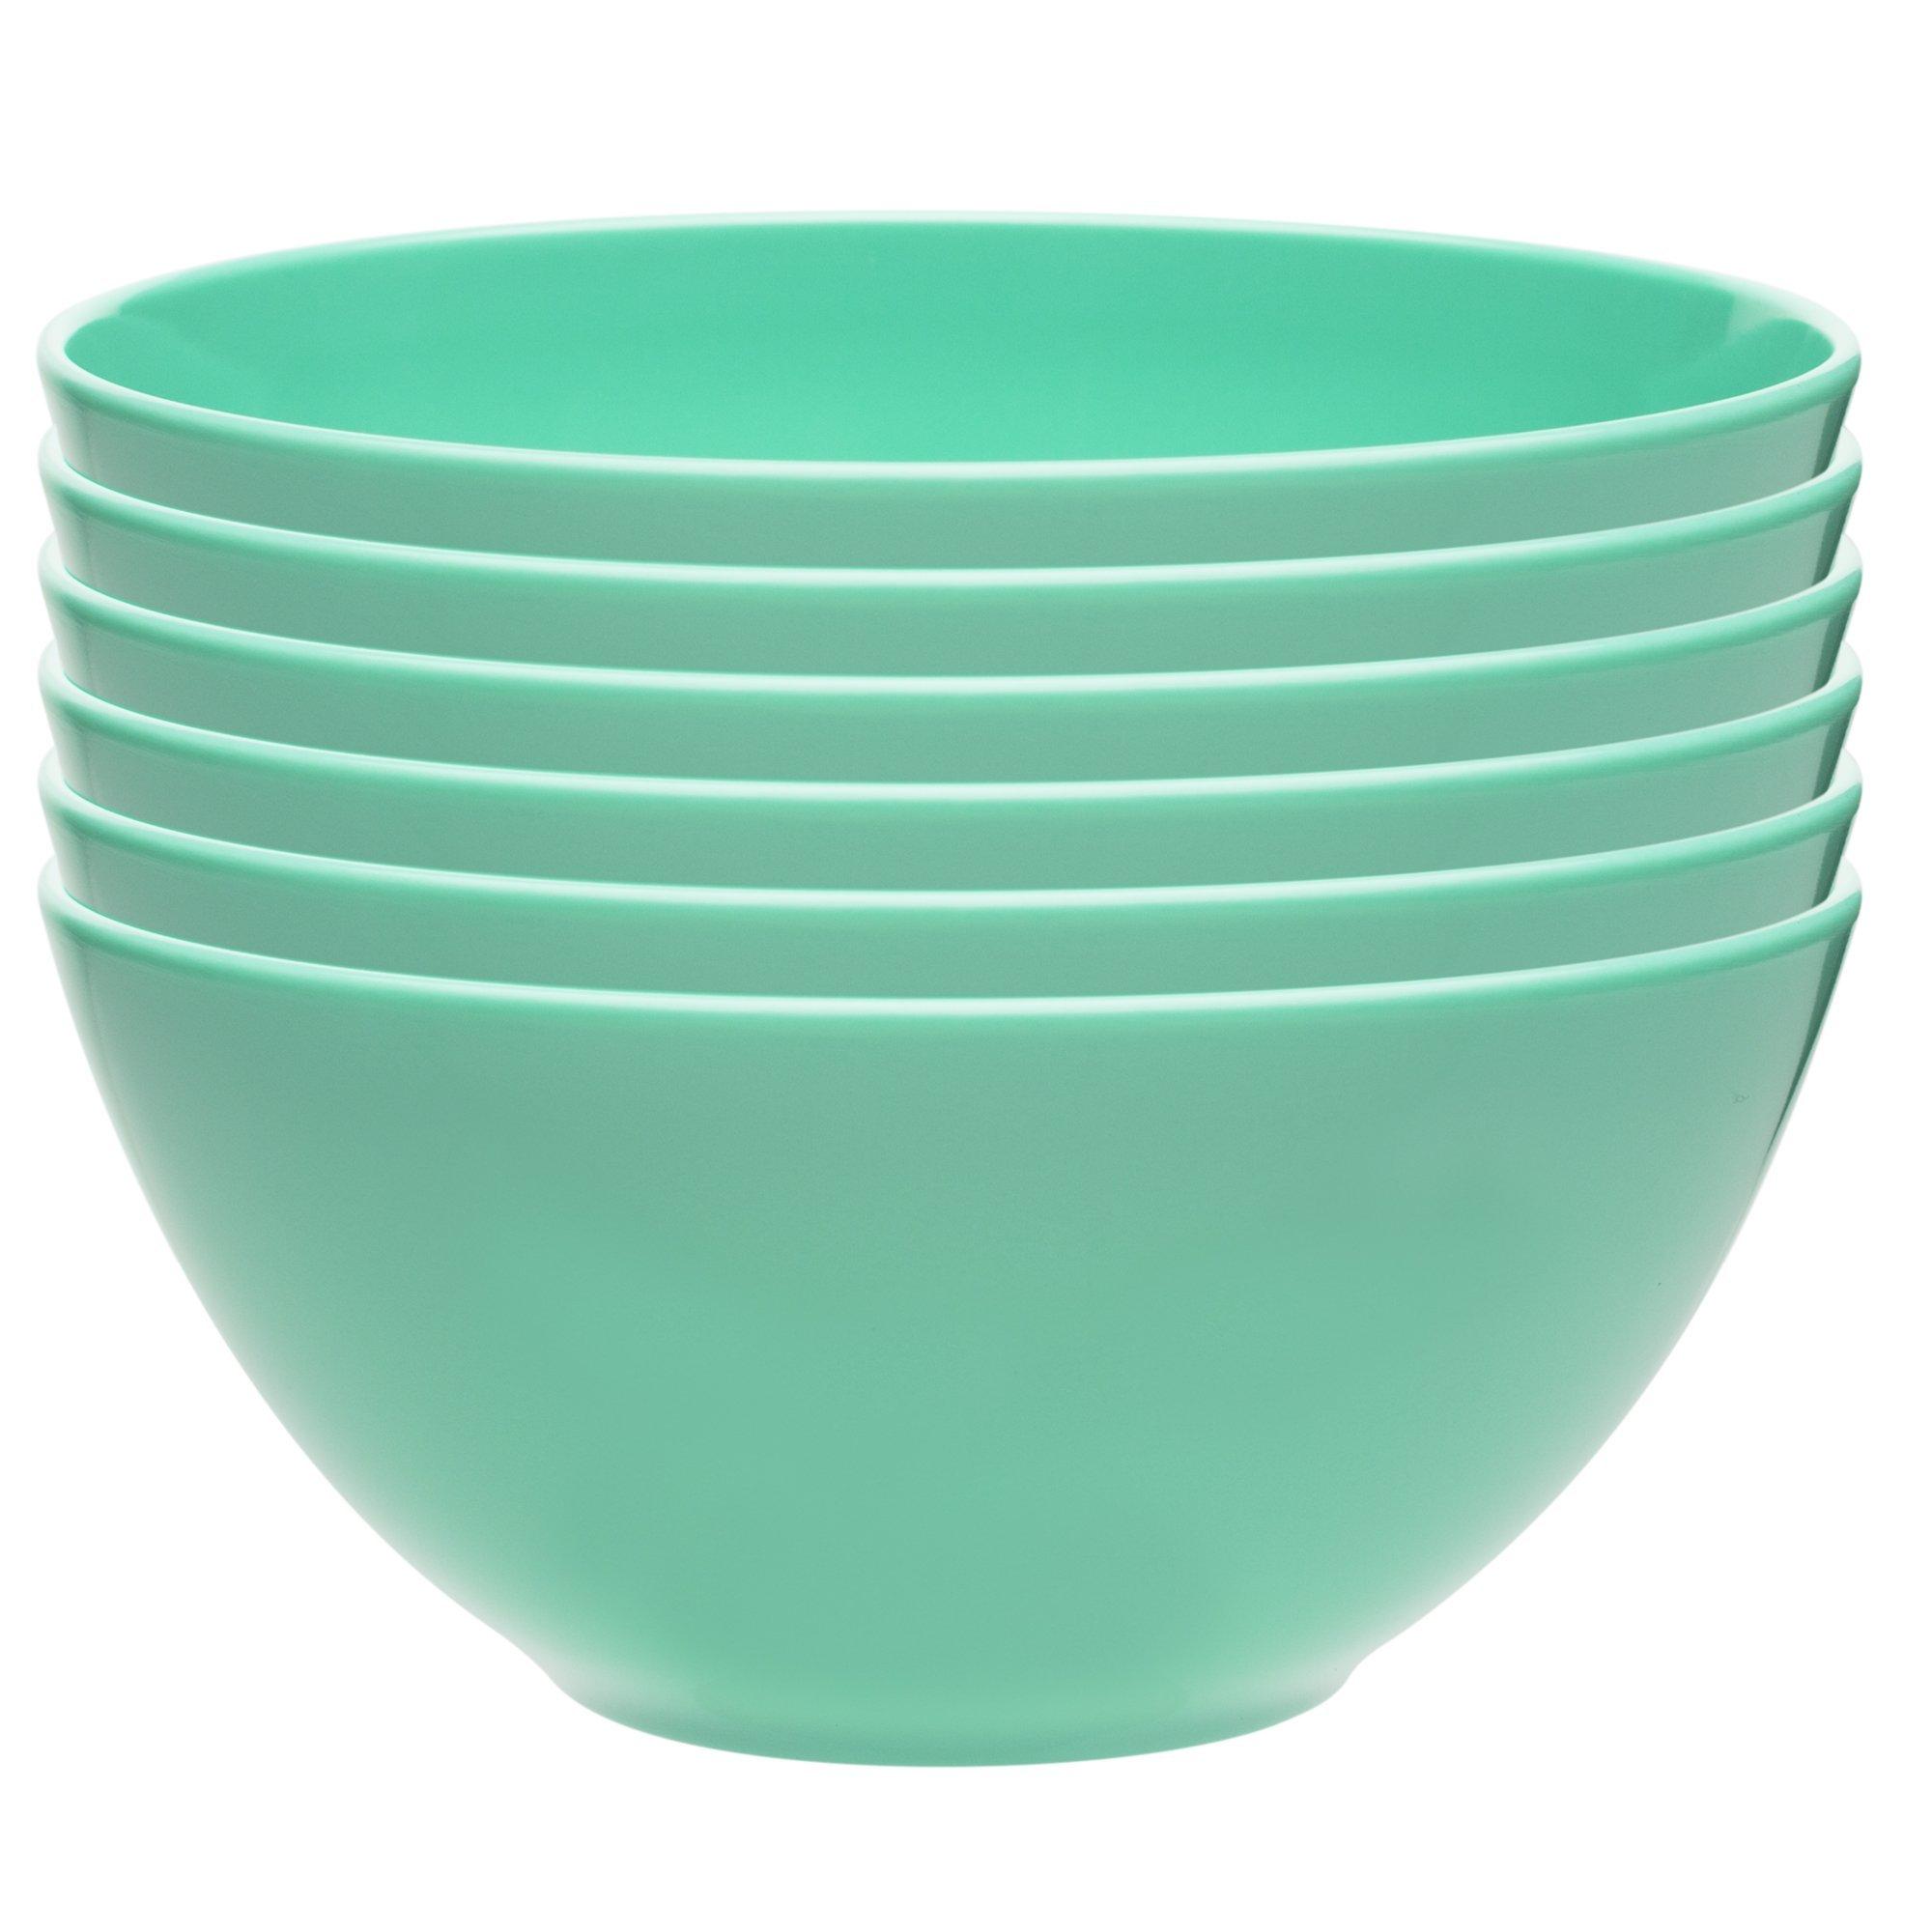 Zak Designs Ella 6-inch Plastic Bowls, Seaglass, 6 piece set